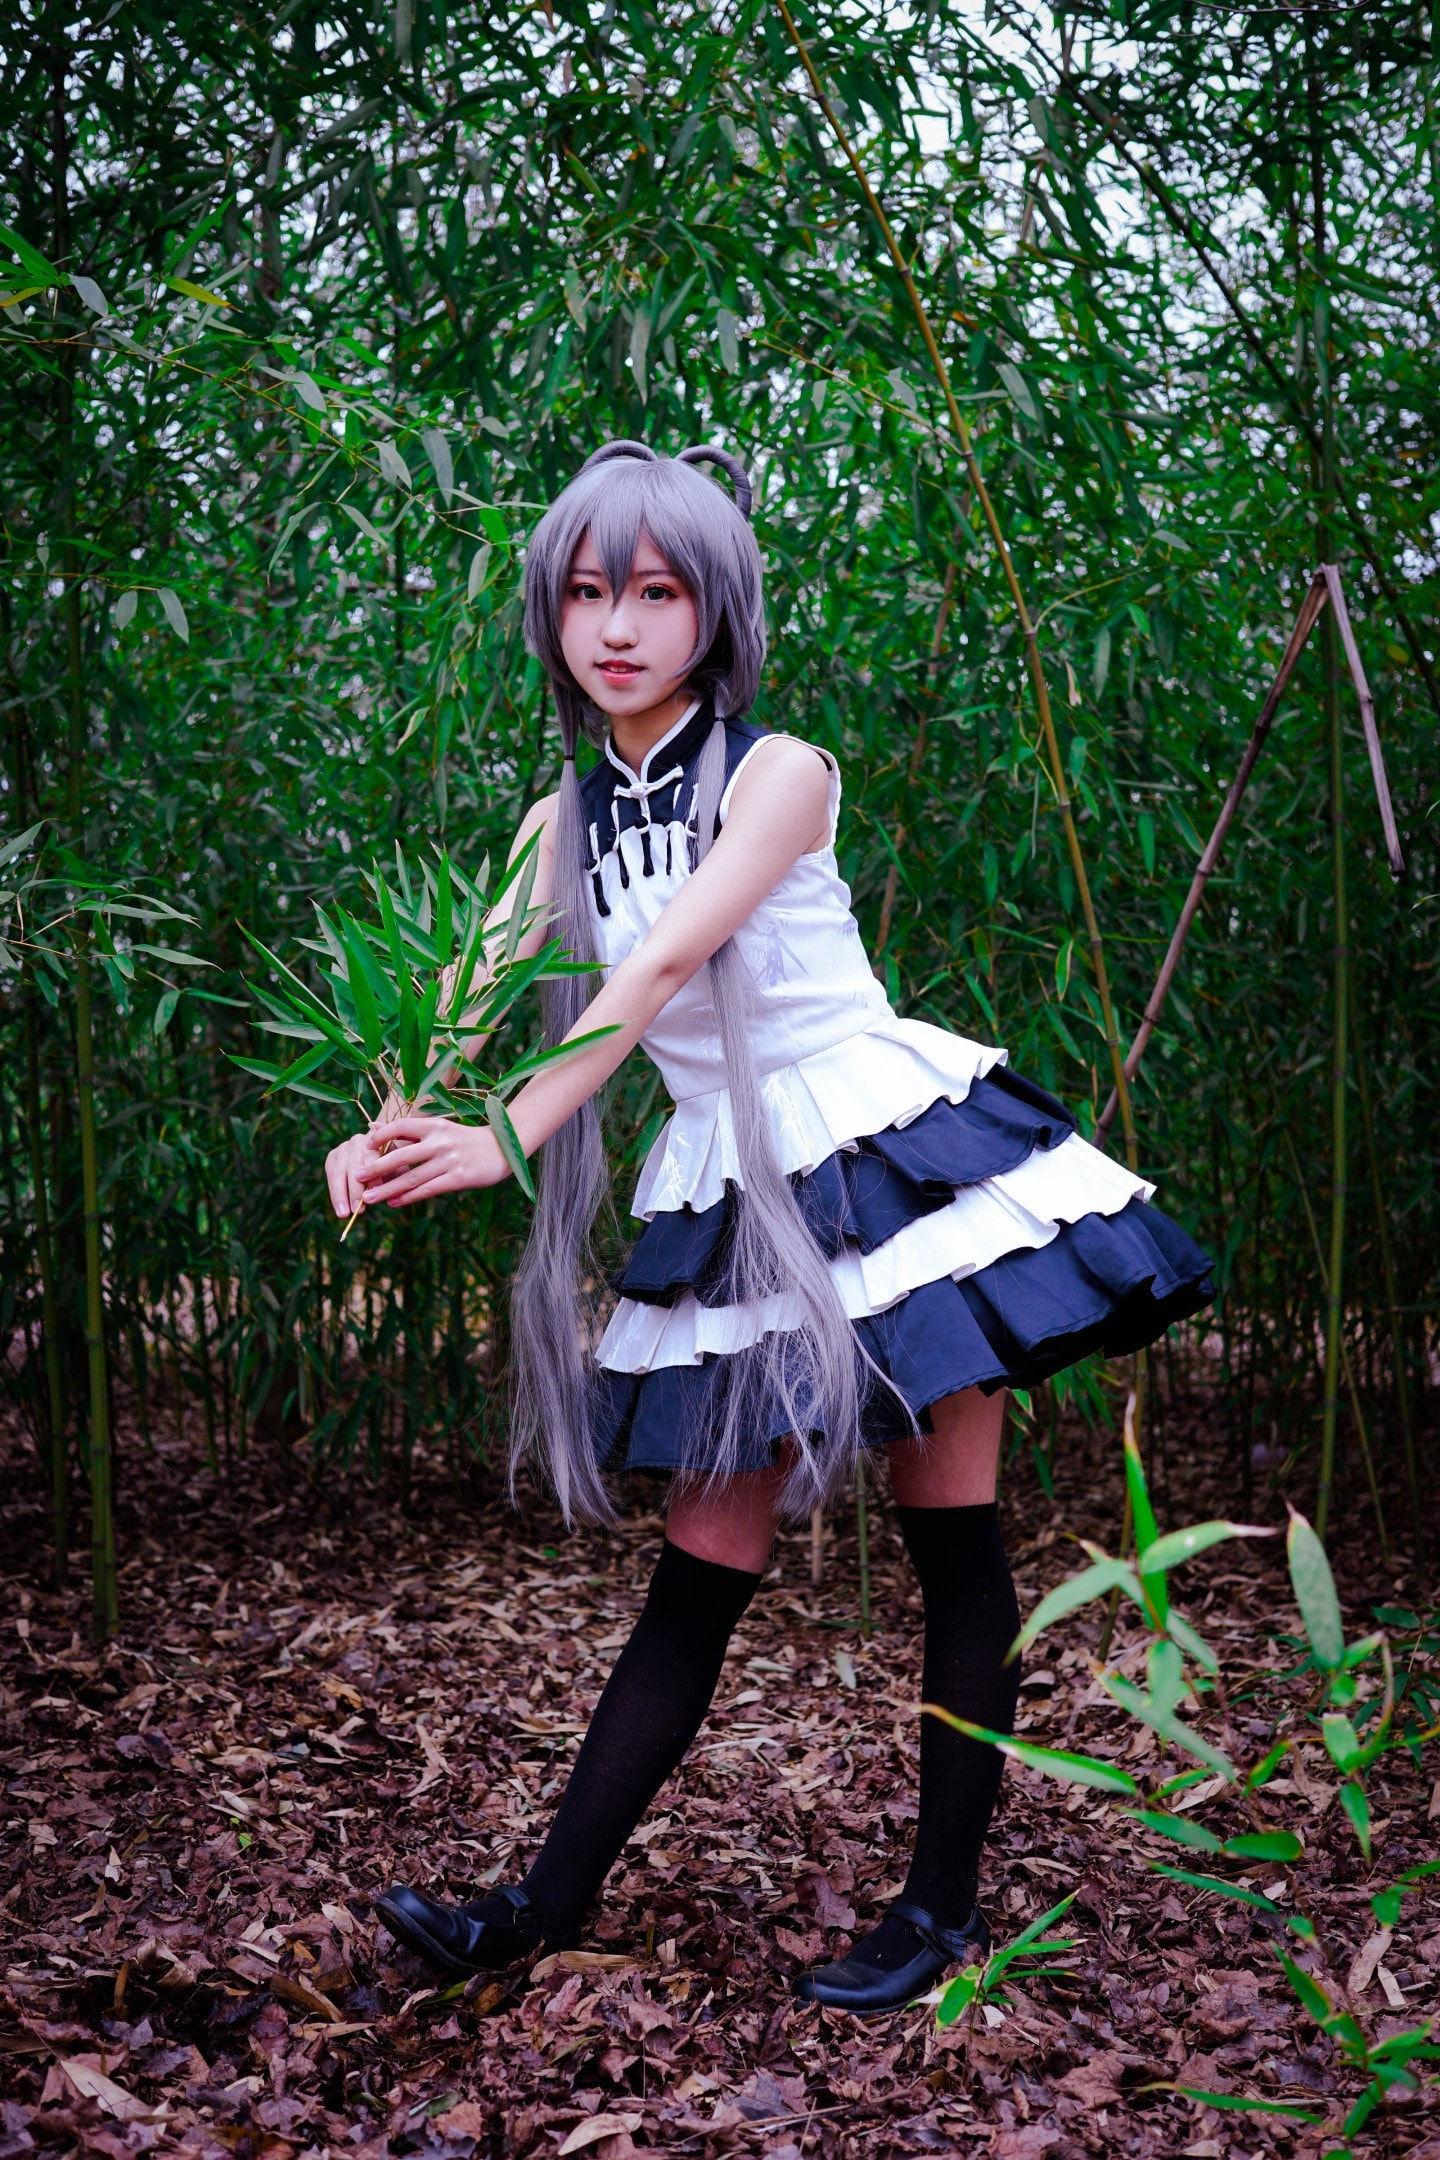 vocaloid洛天依cosplay插图(5)